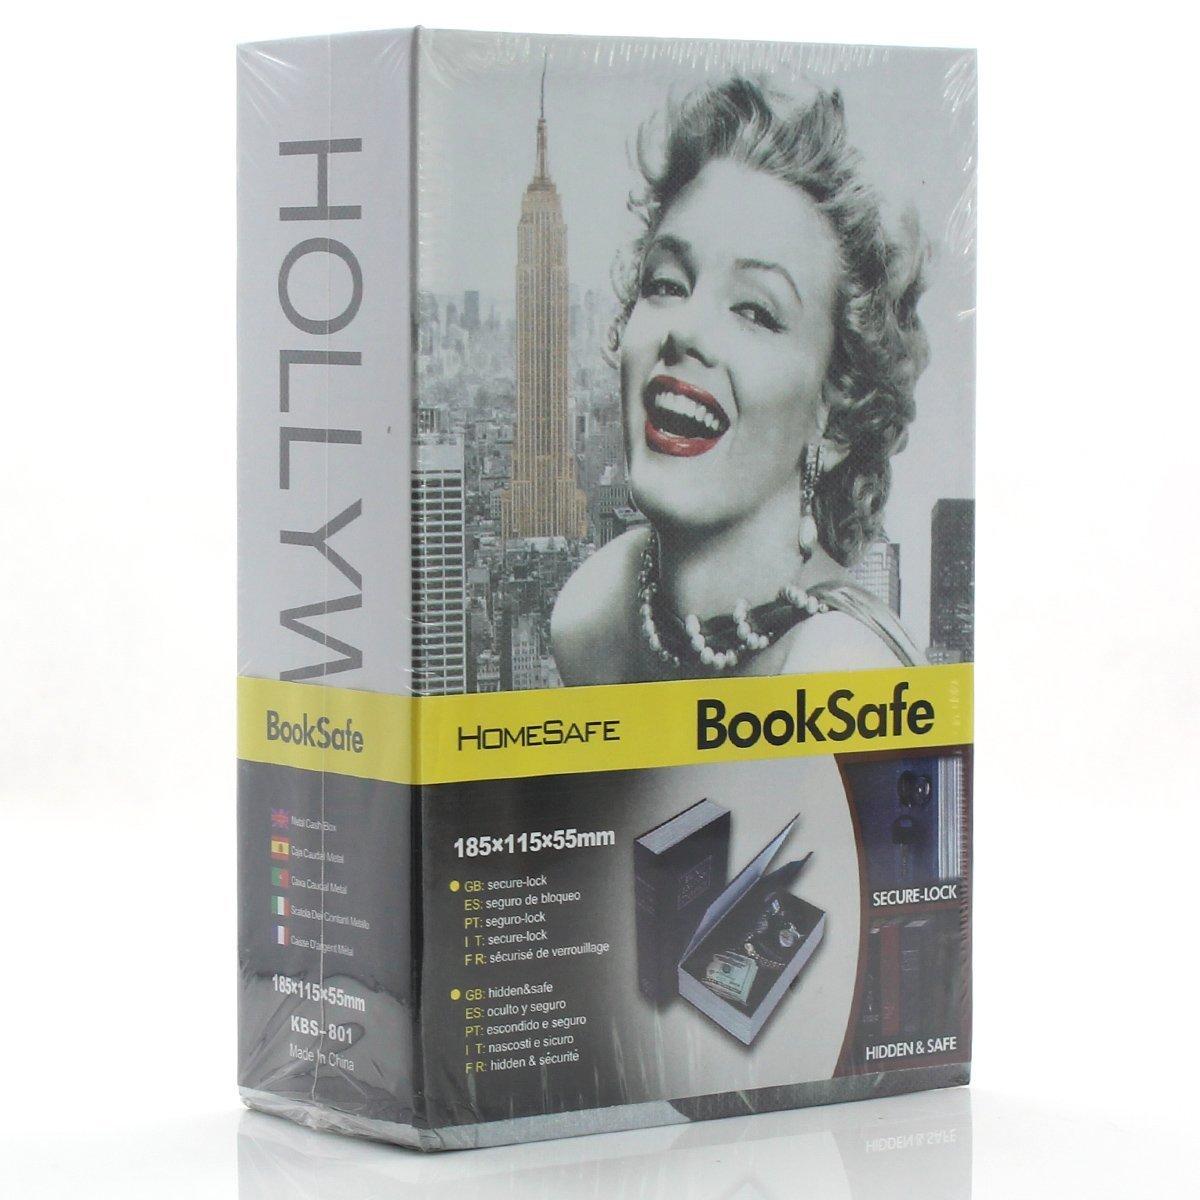 Diversion Book Safes, Kework M Size Book Safe, Diversion Hidden Book Safe With Inside Strong Metal Case and Key Lock, 180 x 115 x 55 mm (Marilyn Monroe)